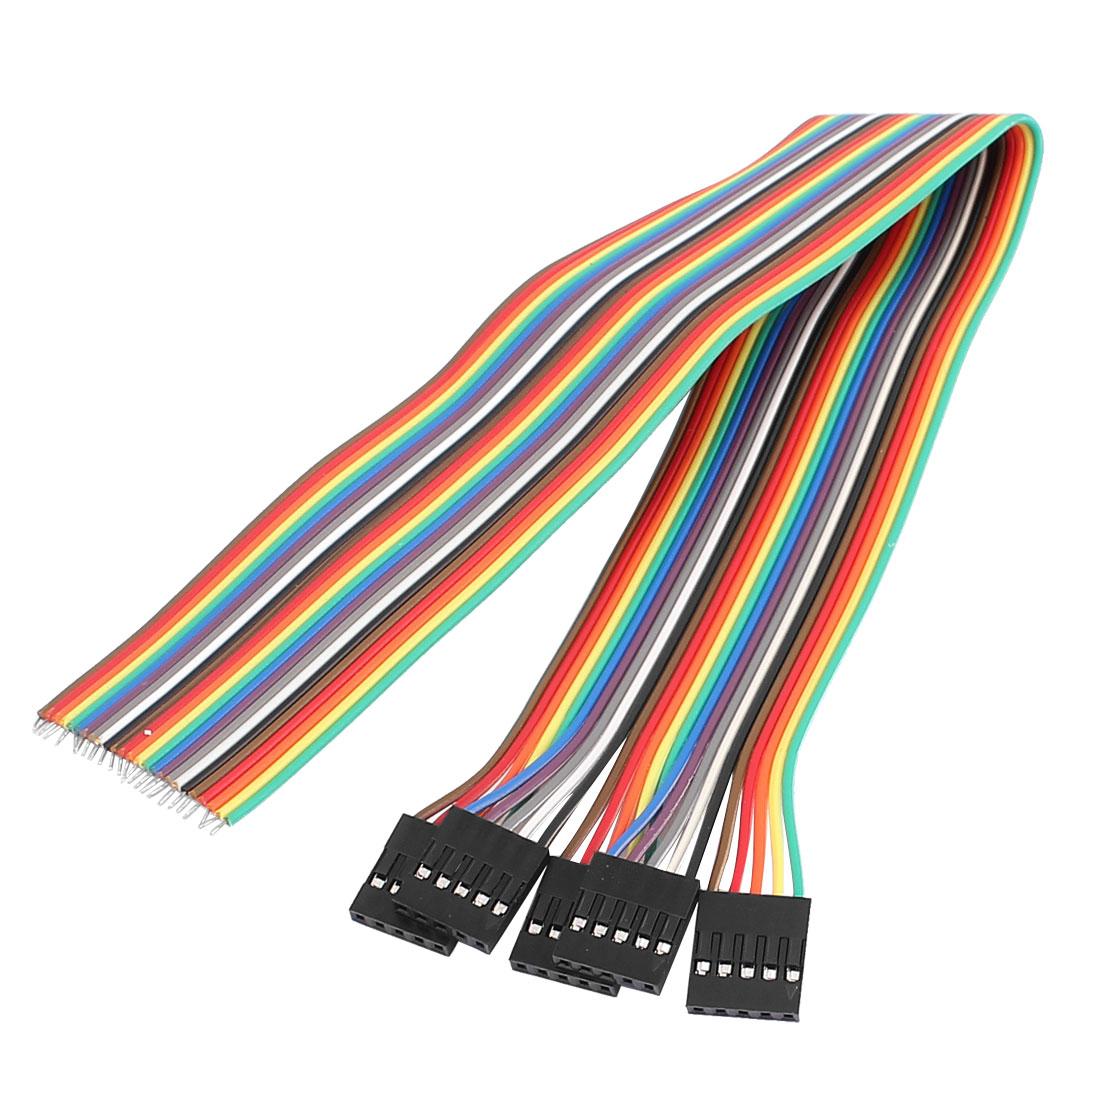 5 Pcs 30cm Length Female 2.54mm Pitch 5P Single Head Jumper Wire Cable